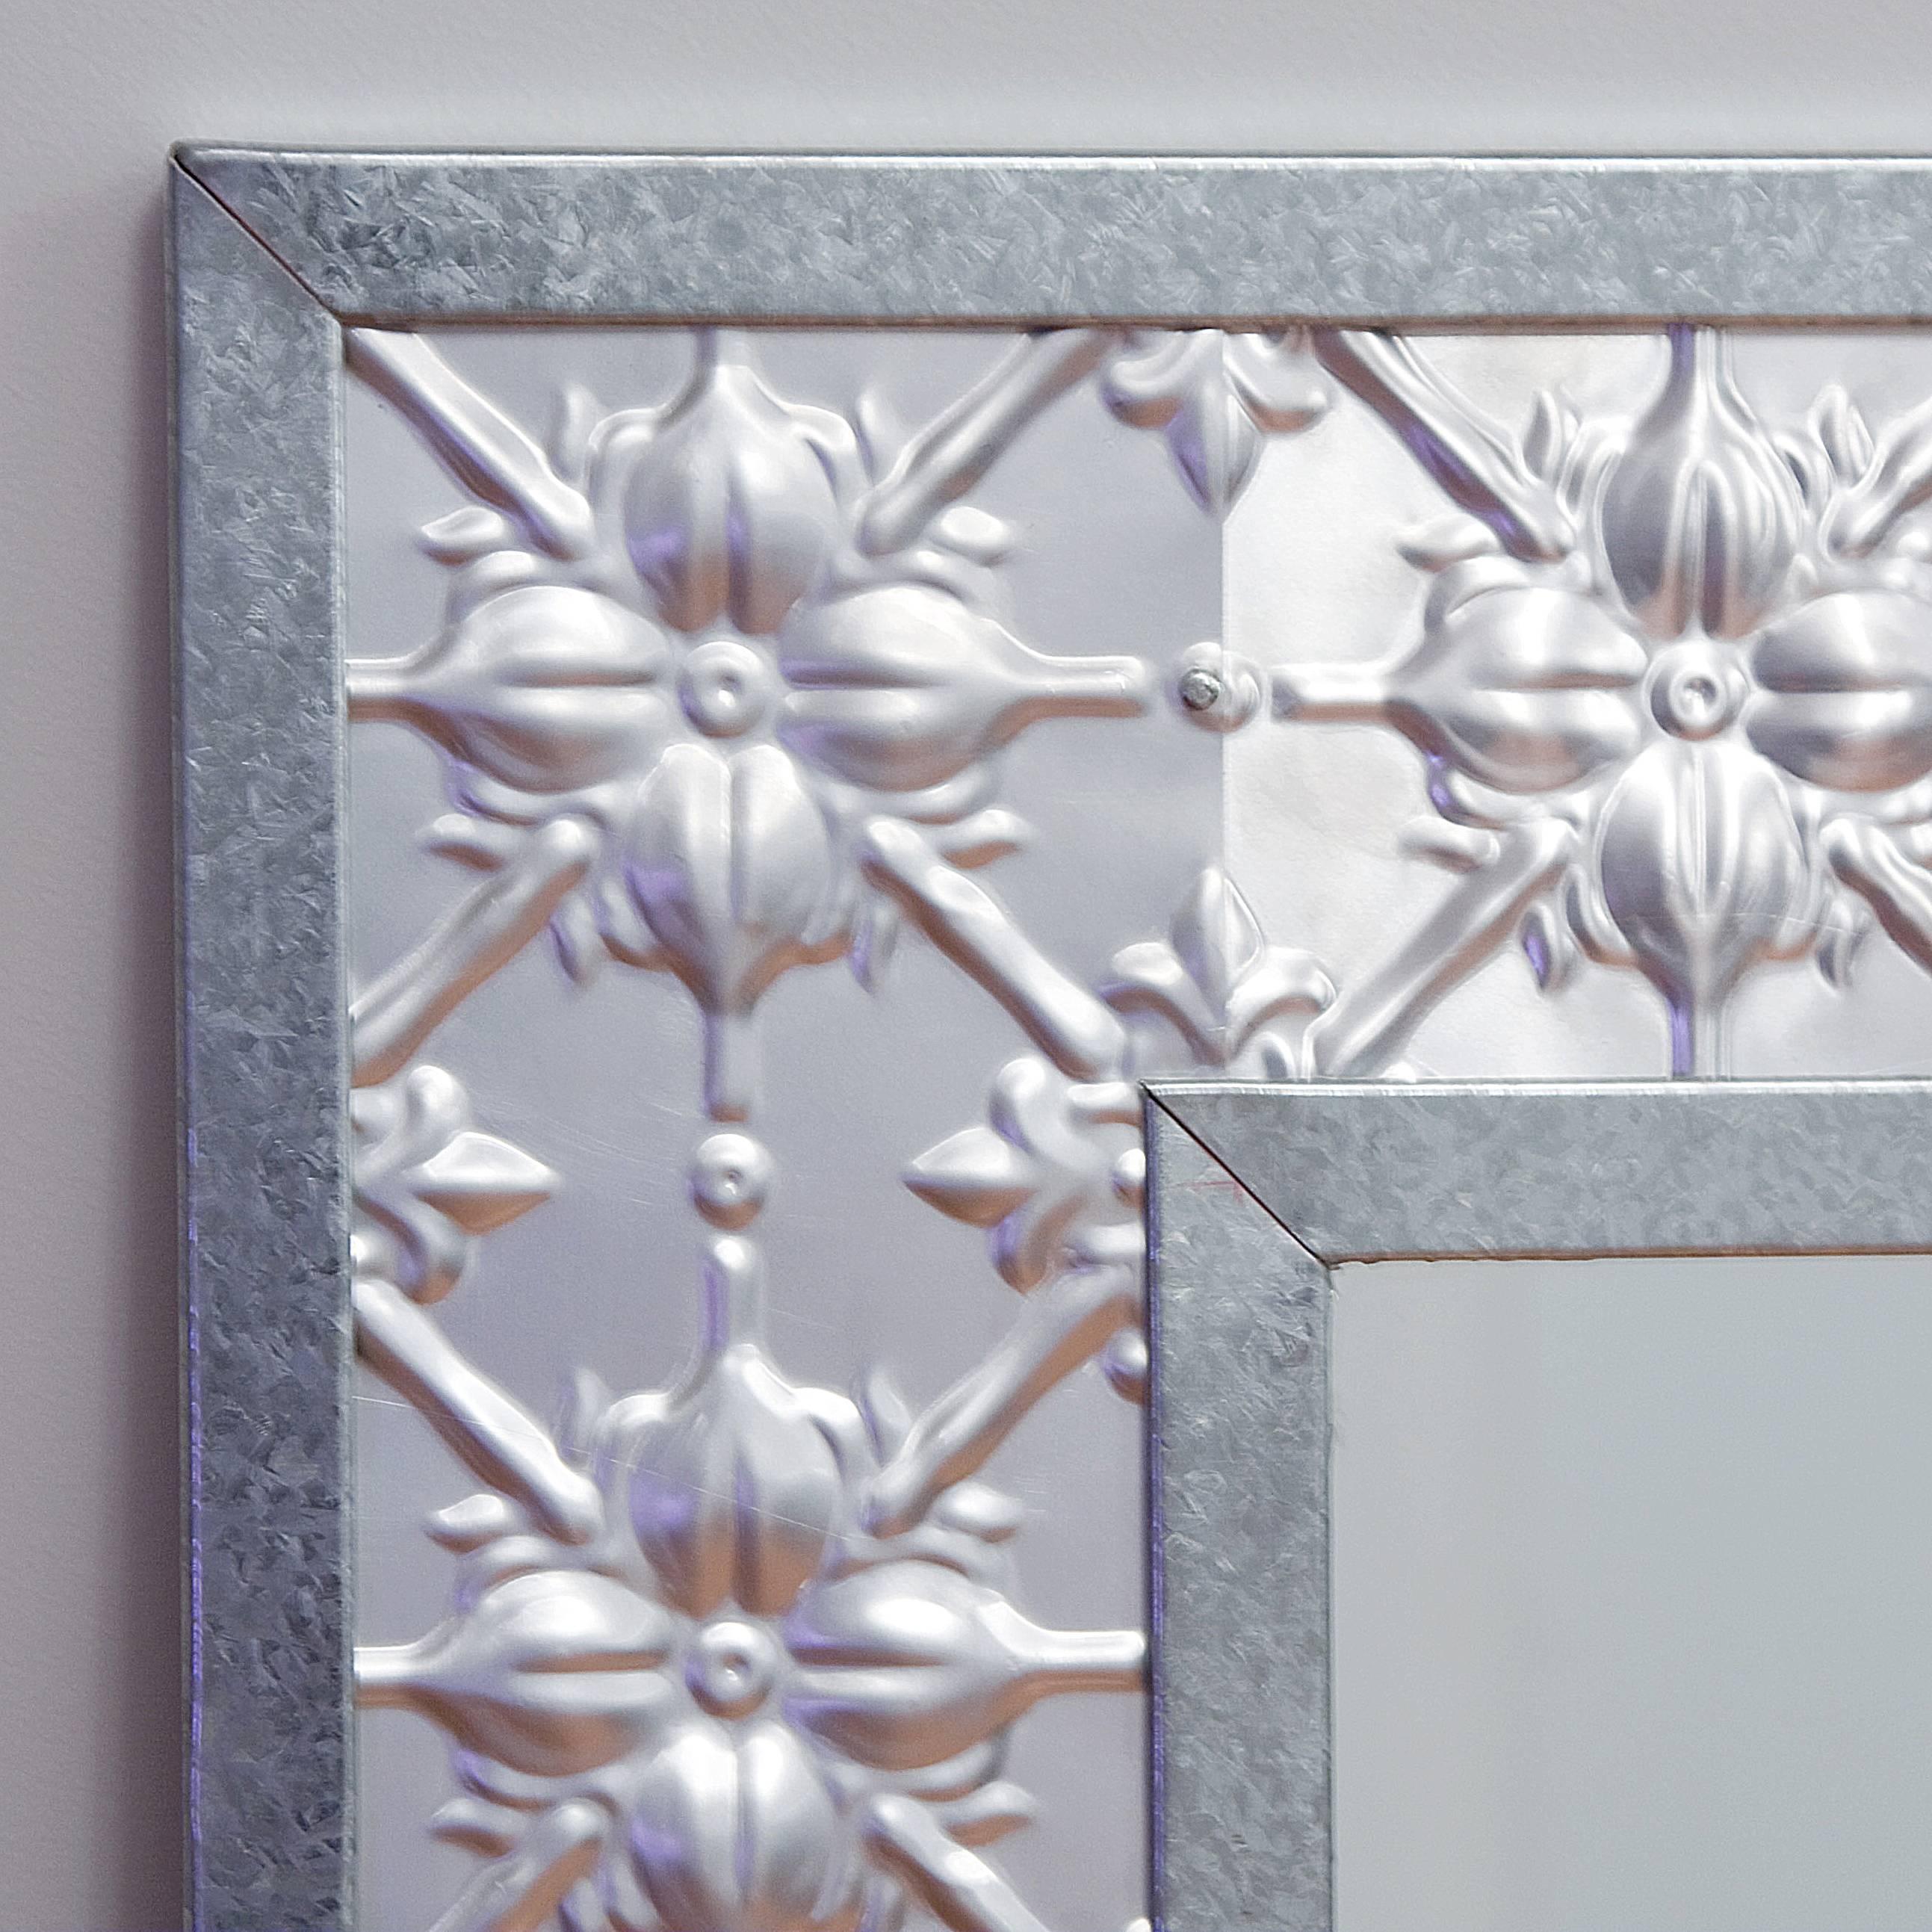 Pressed Tin Mirrors regarding Pressed Tin Mirrors (Image 19 of 25)